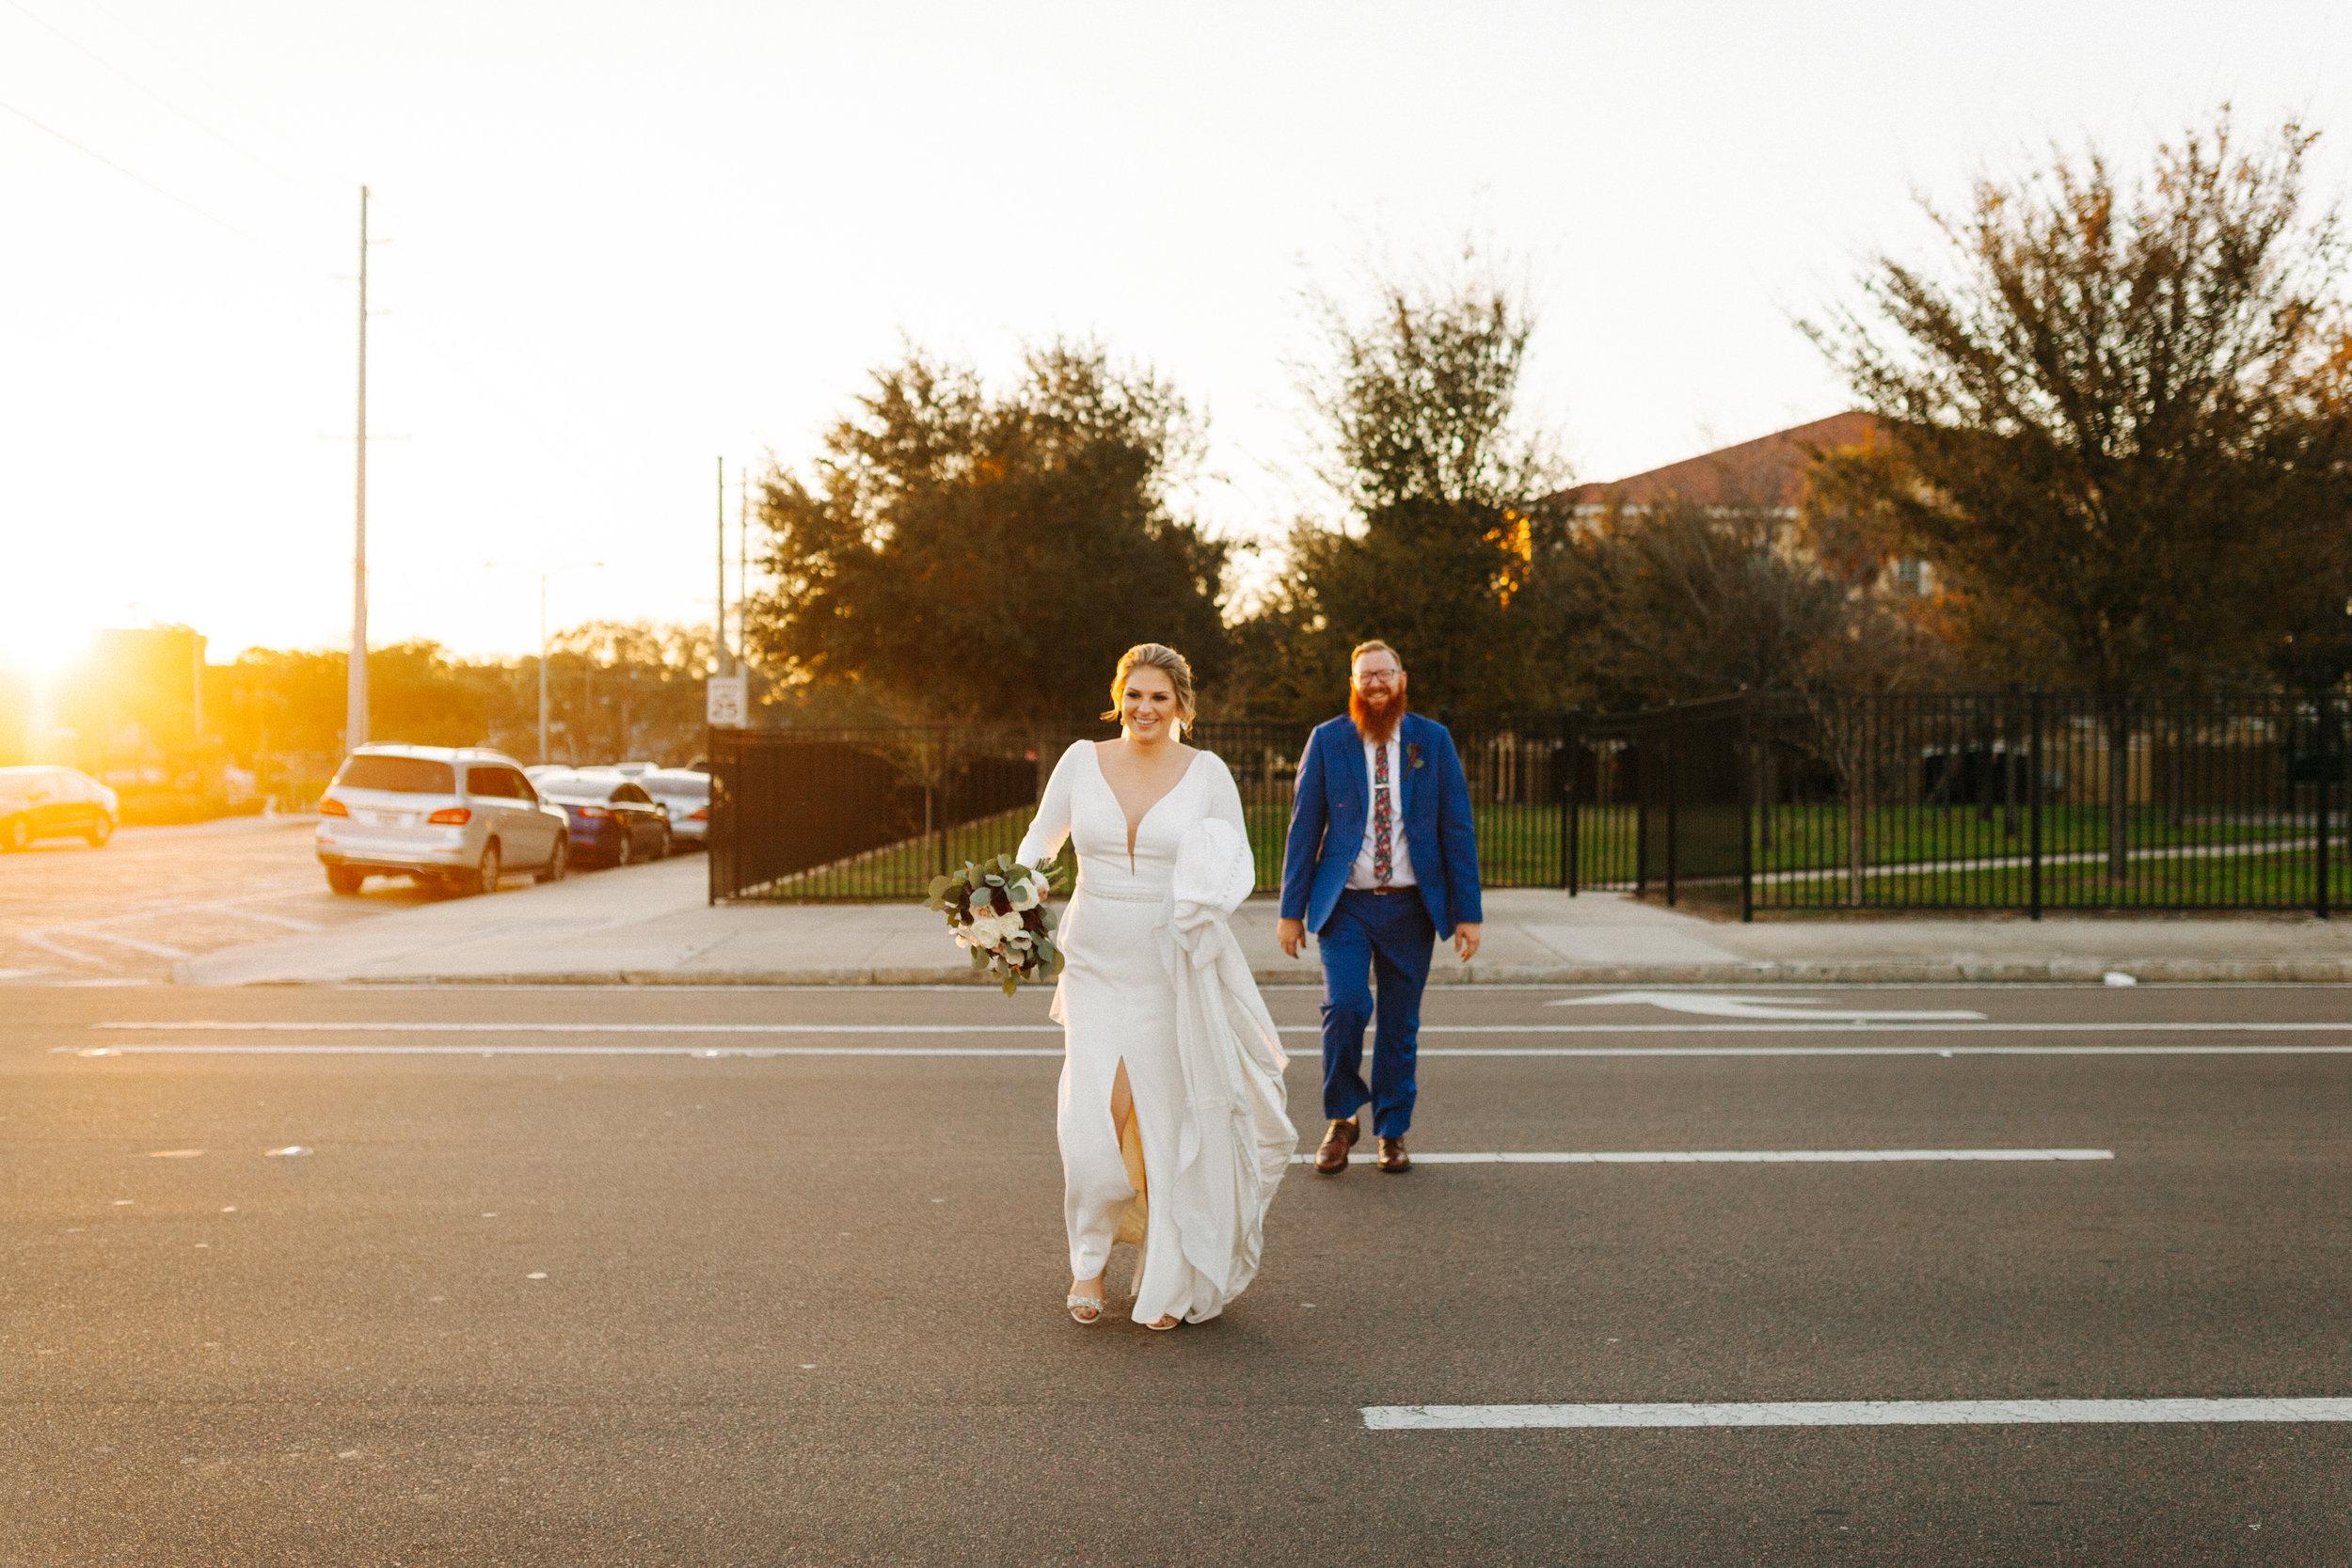 Mike & Heather - Portraits - Jake & Katie Photography_252.jpg